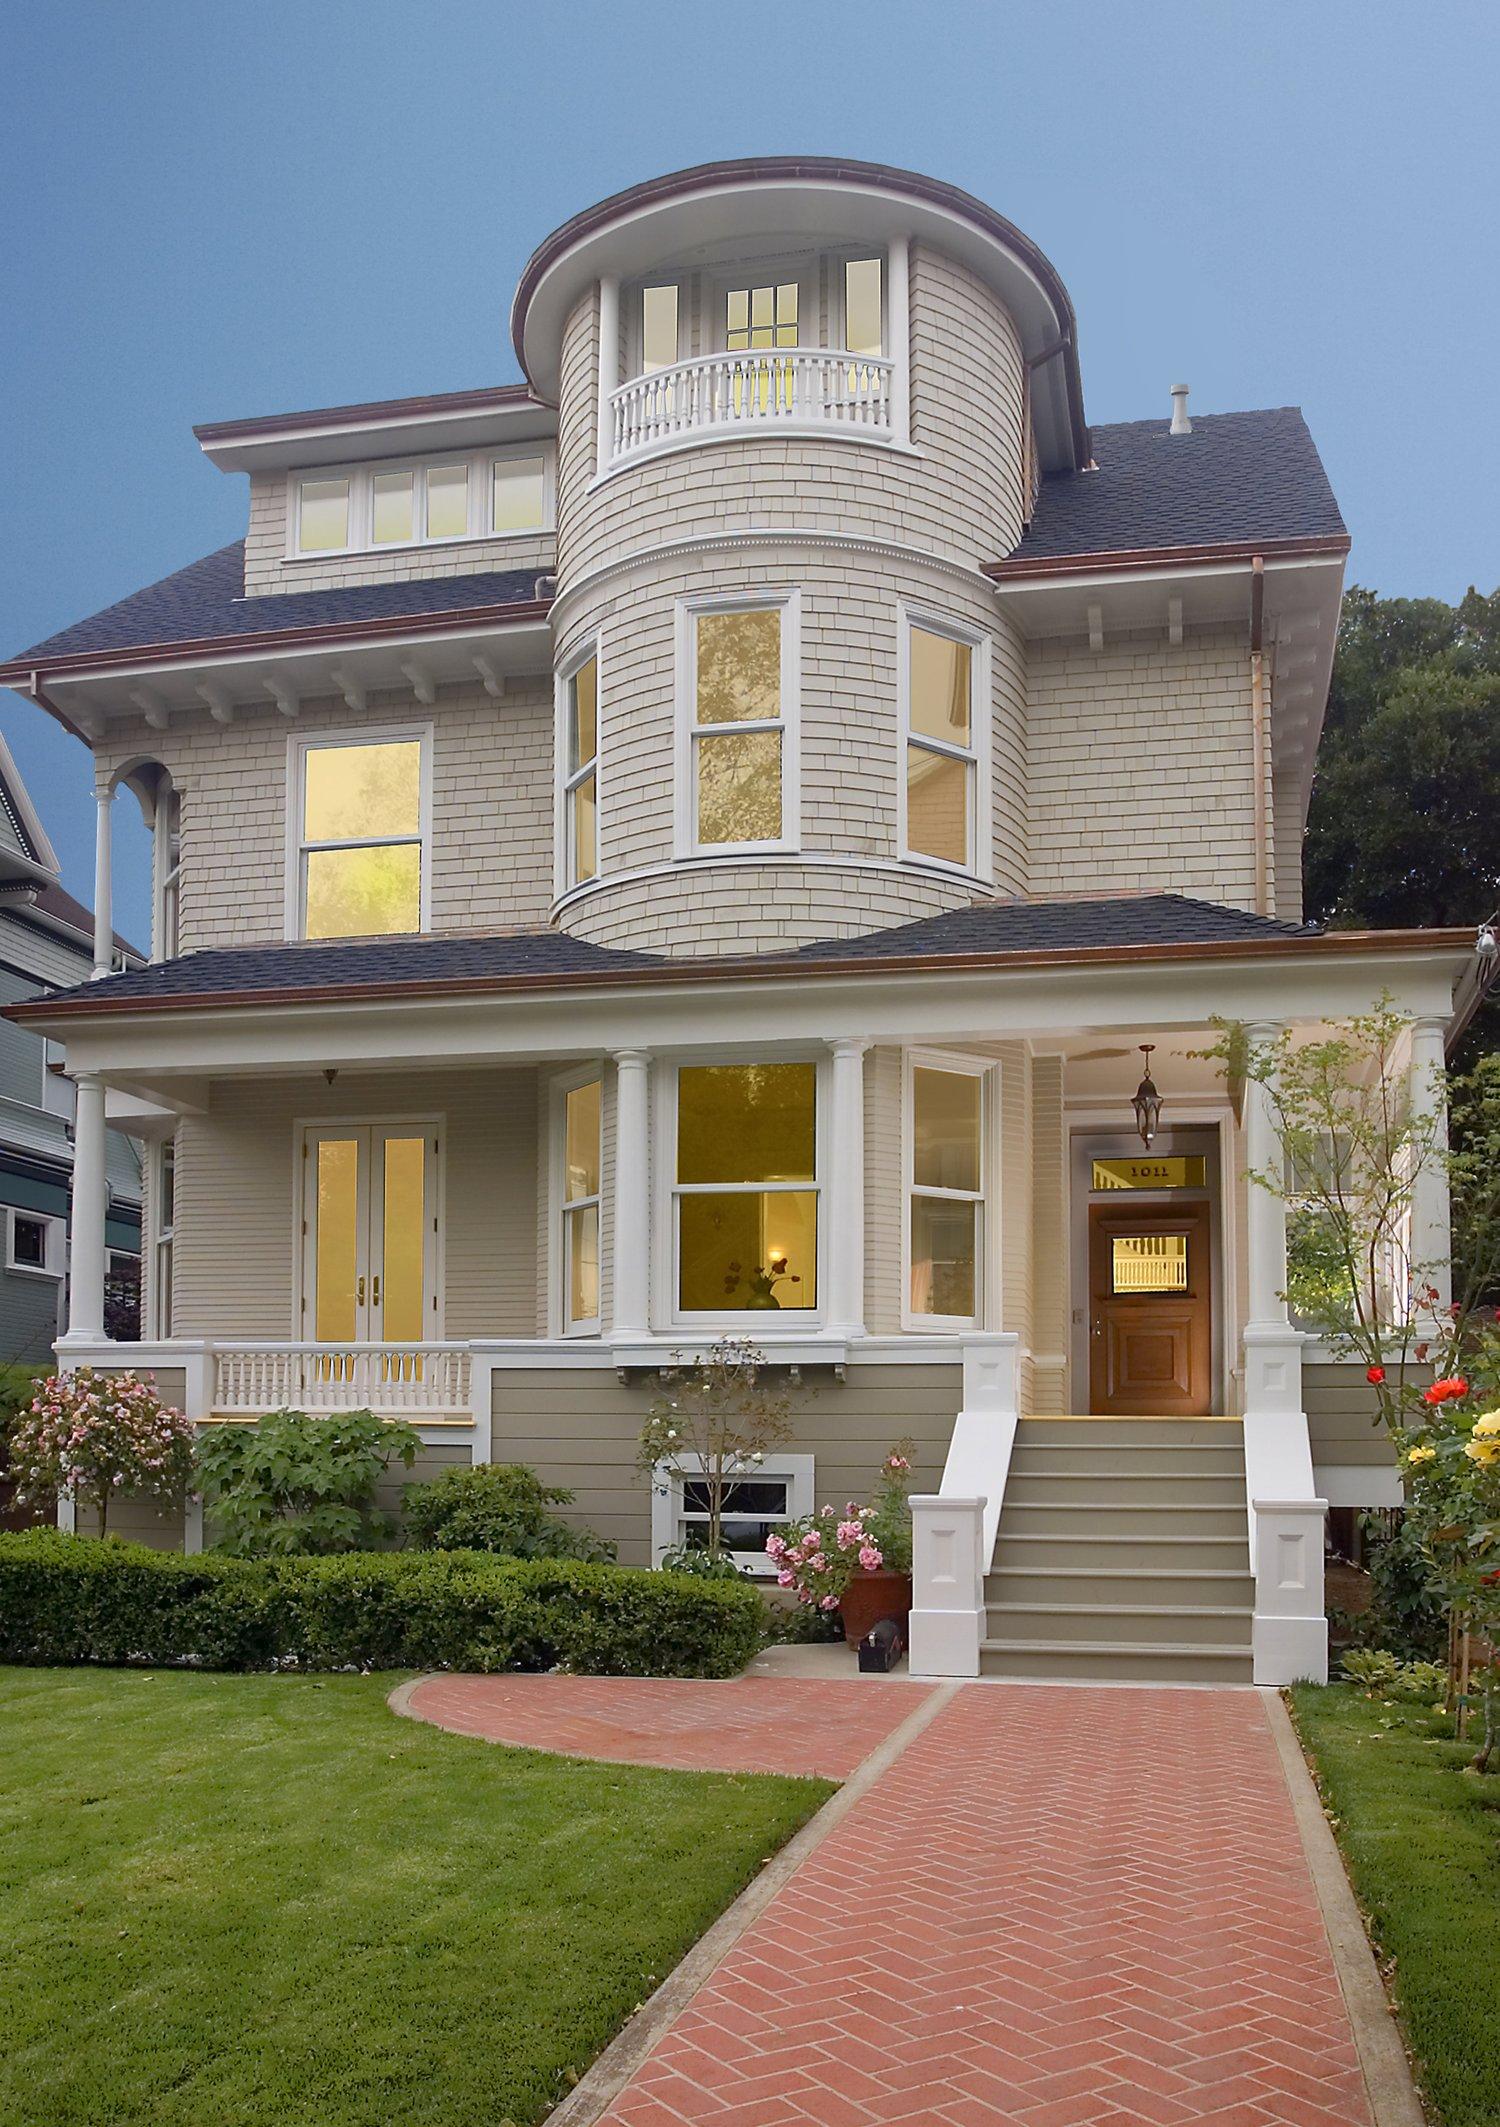 Gary Knox-Bennett House, Alameda